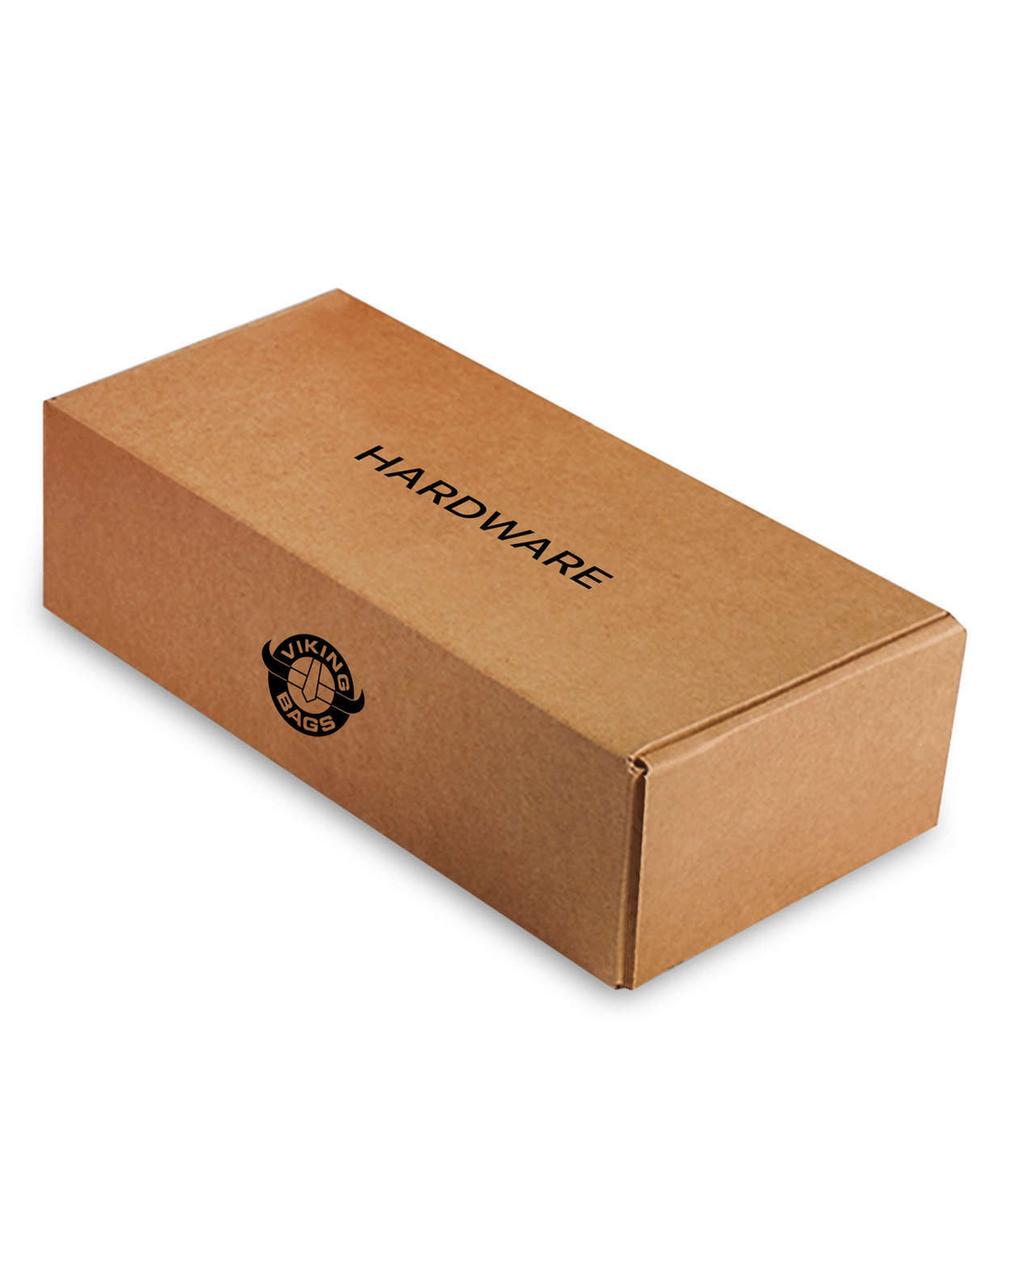 Honda Magna 750 Medium Warrior Motorcycle Saddlebags box